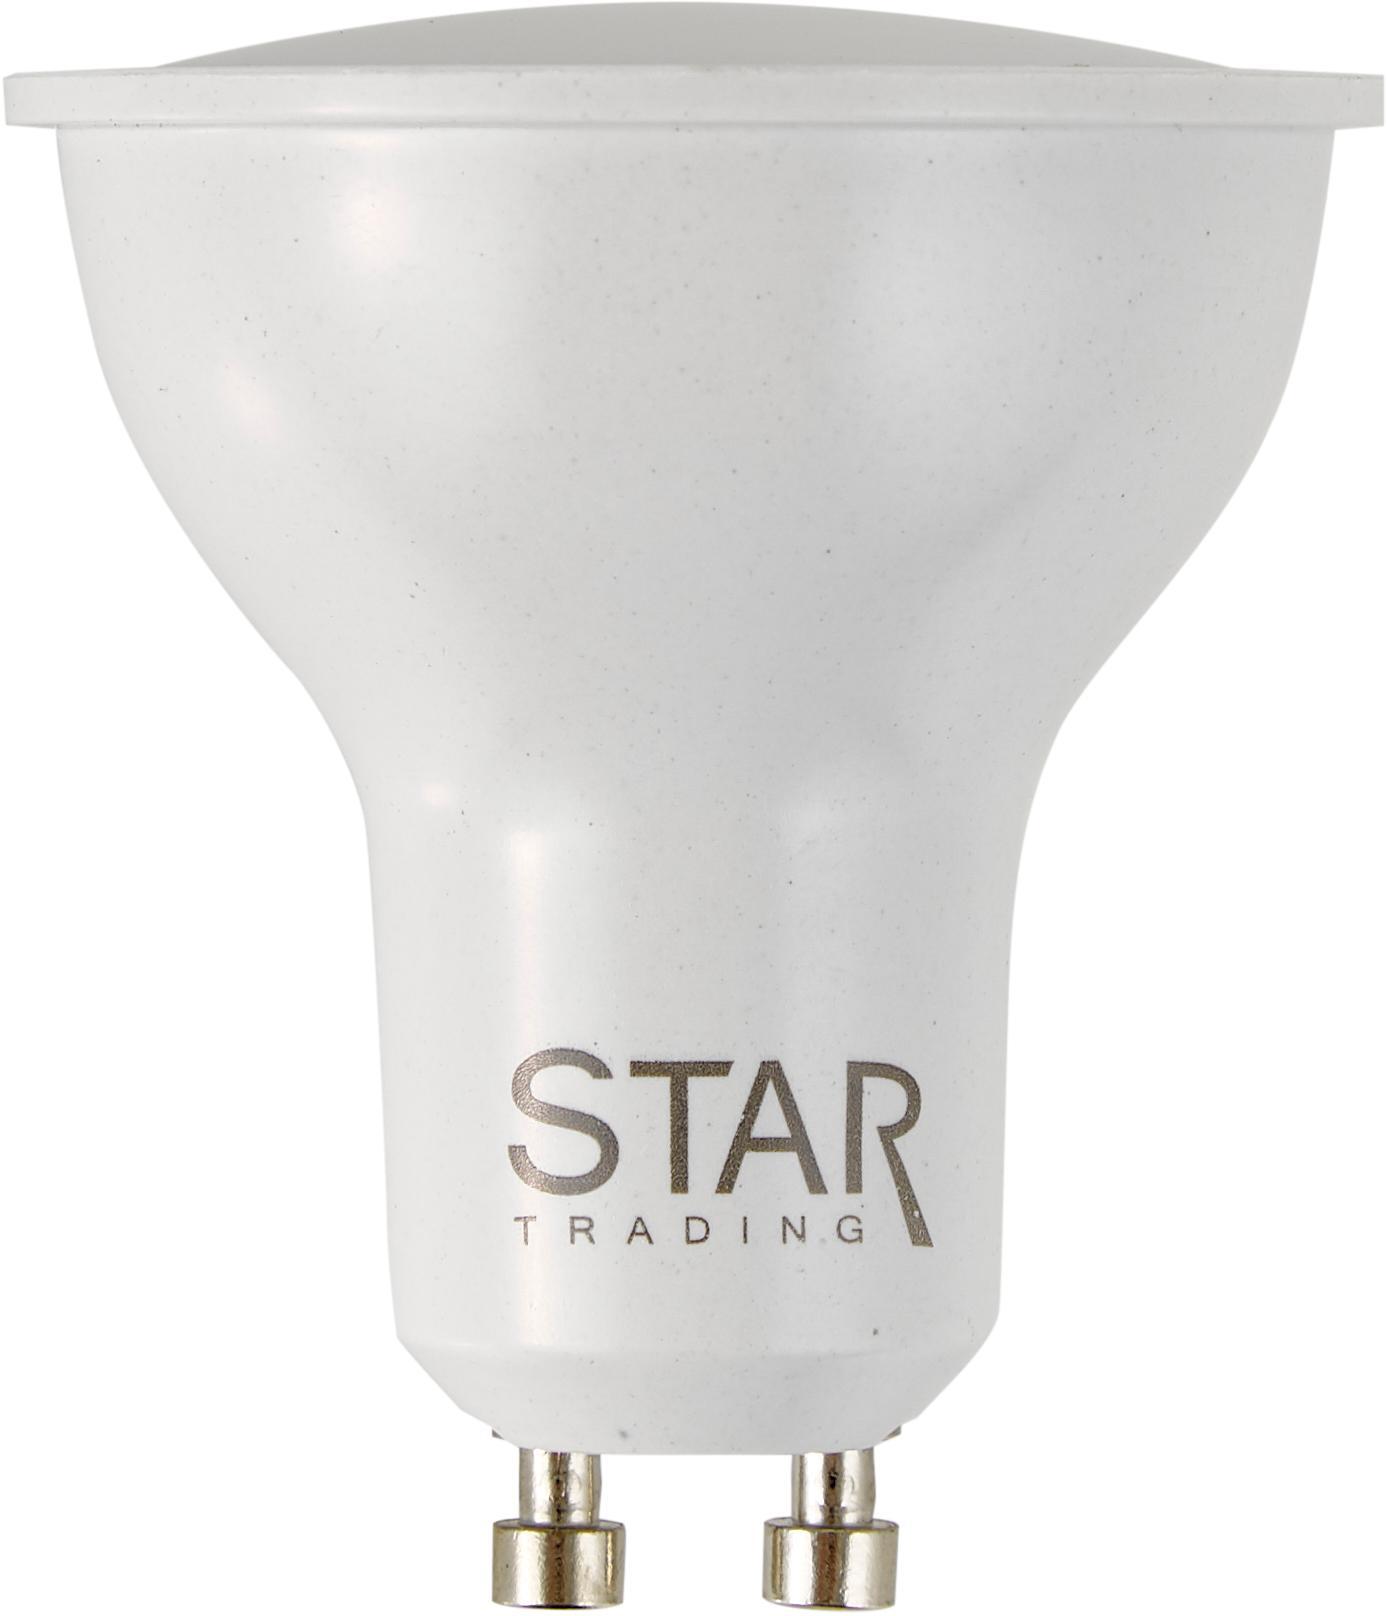 Dimmbares LED Leuchtmittel Dim To Warm (GU10/5.5W), Leuchtmittelschirm: Kunststoff, Leuchtmittelfassung: Aluminium, Weiss, Ø 5 x H 6 cm